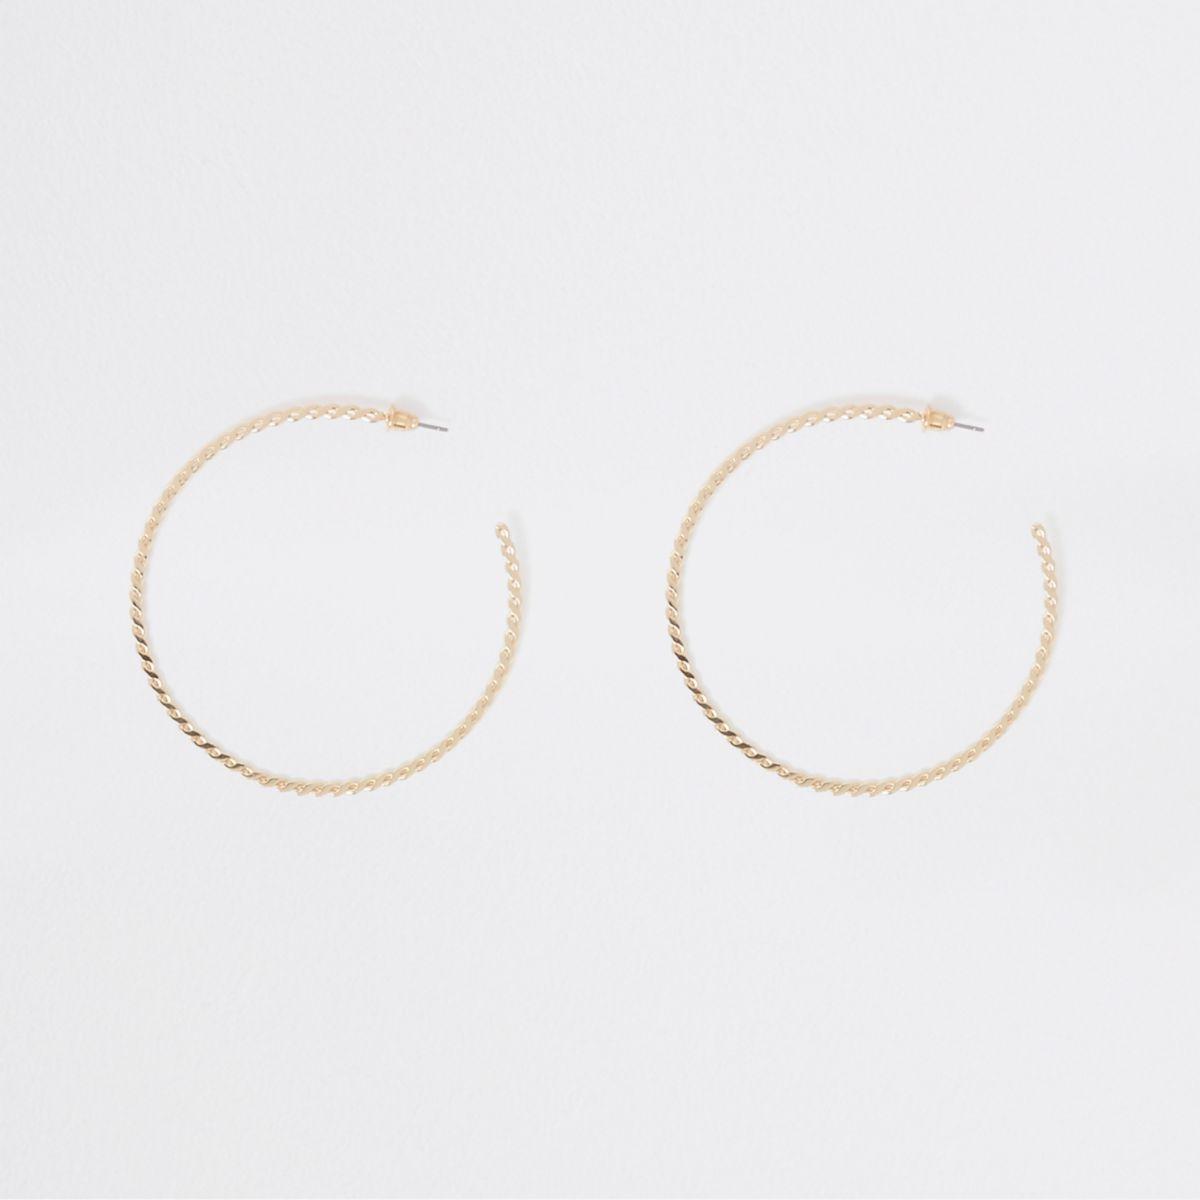 Gold tone large twisted hoop earrings